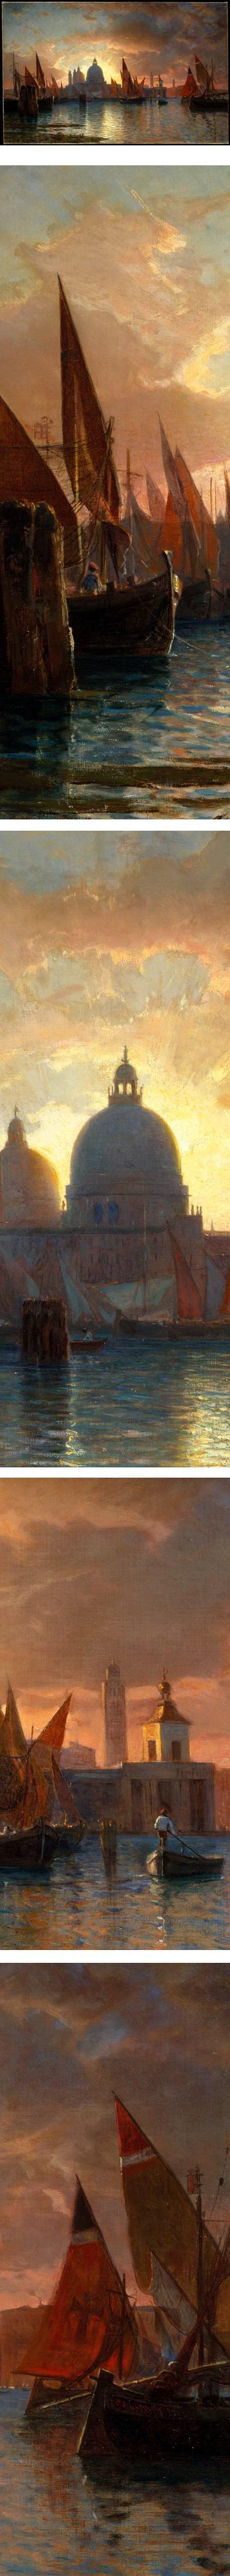 Santa Maria della Salute, Sunset; William Stanley Haseltine